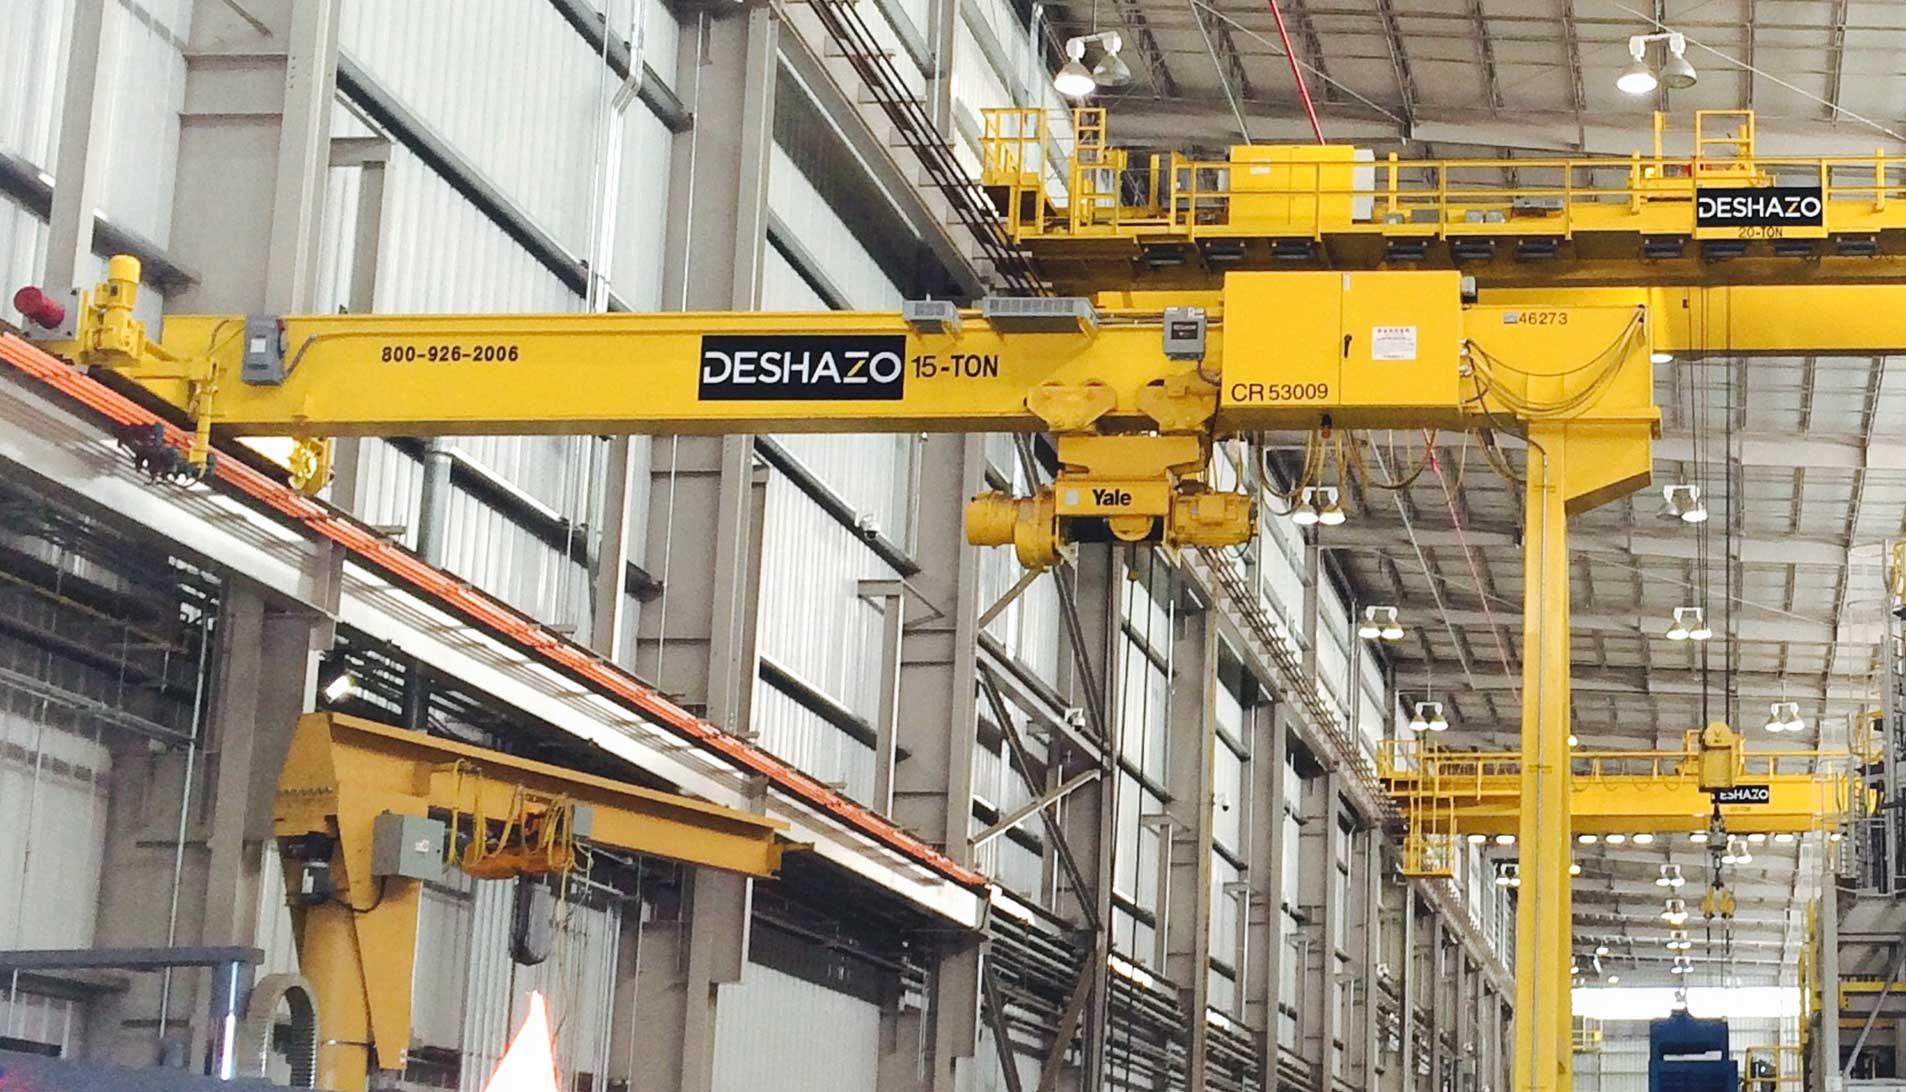 Cranes | DESHAZO: Overhead Cranes, Automation, and Service